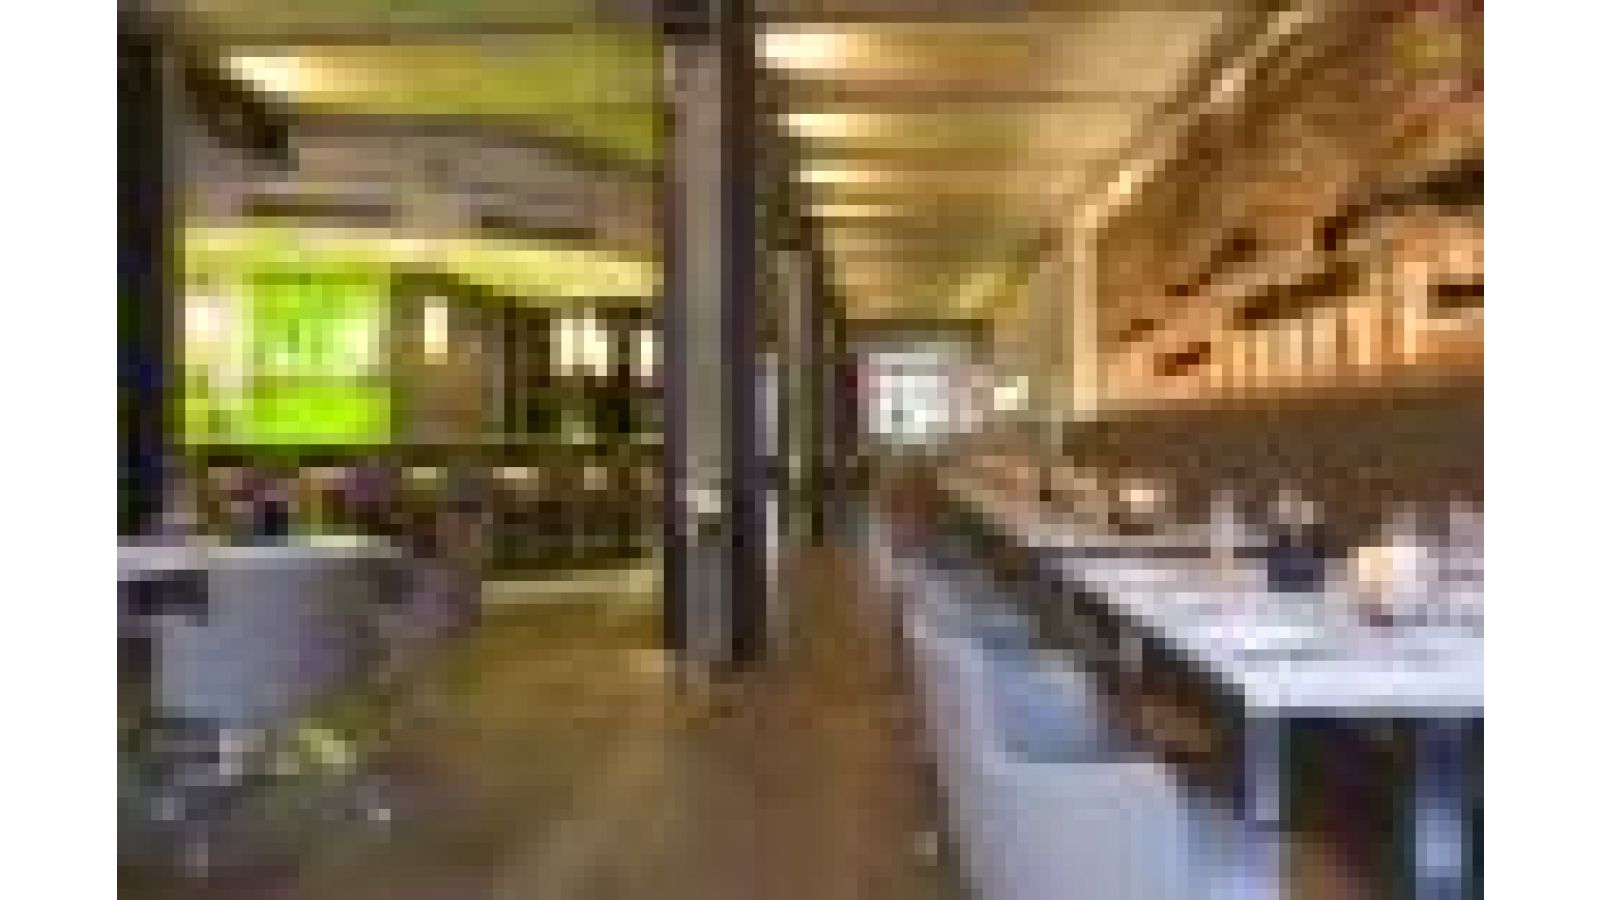 Restaurant VLET, Hamburg